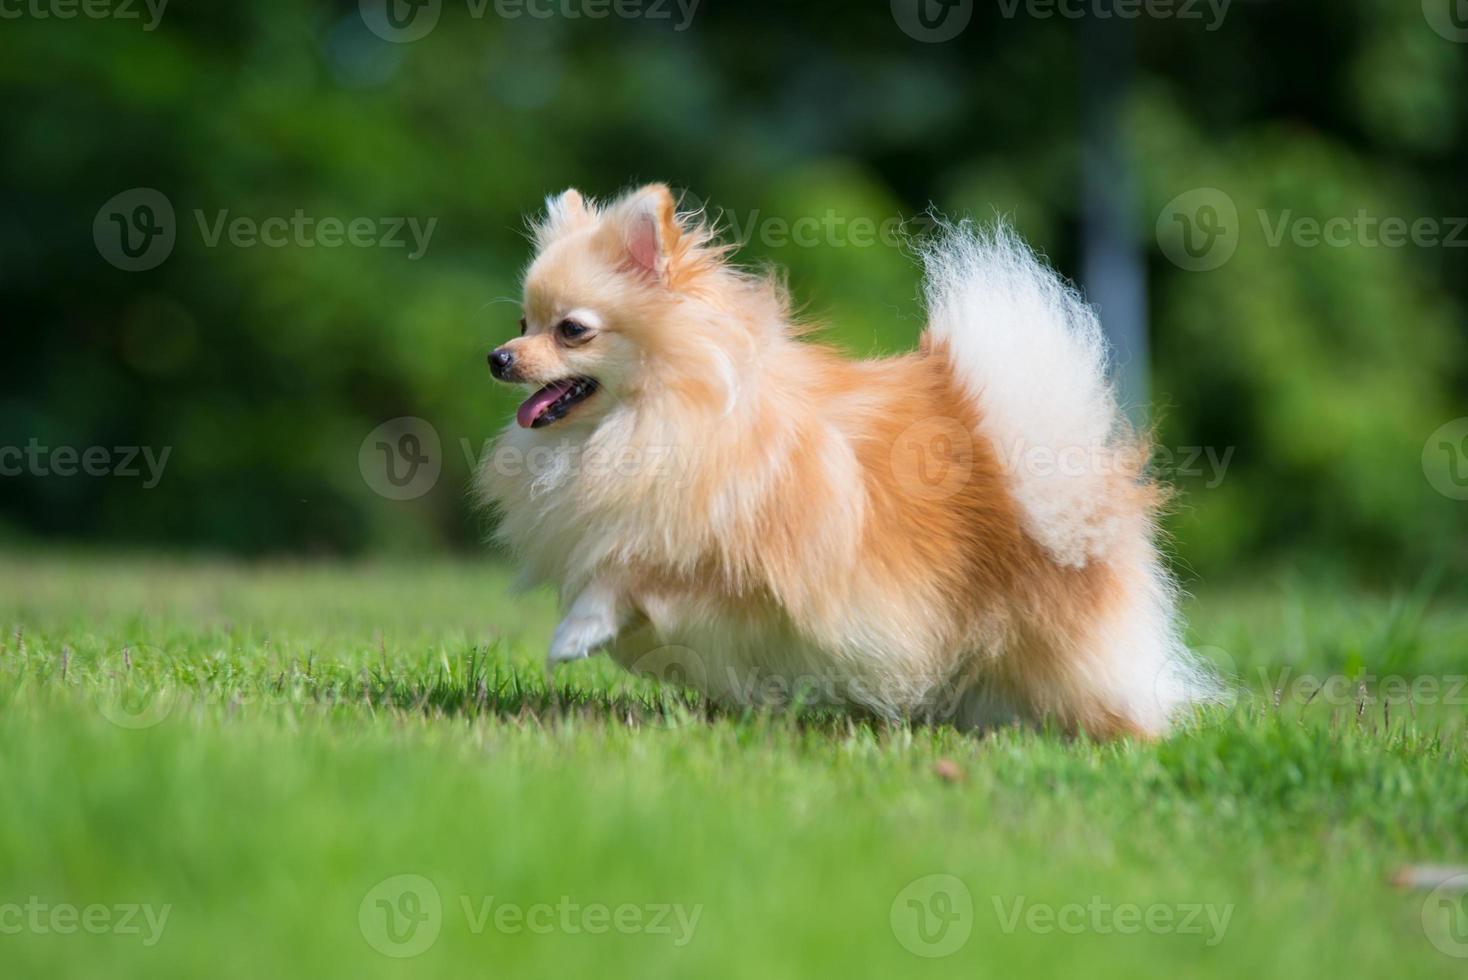 pequeno cão pomeranian laranja runing na grama foto